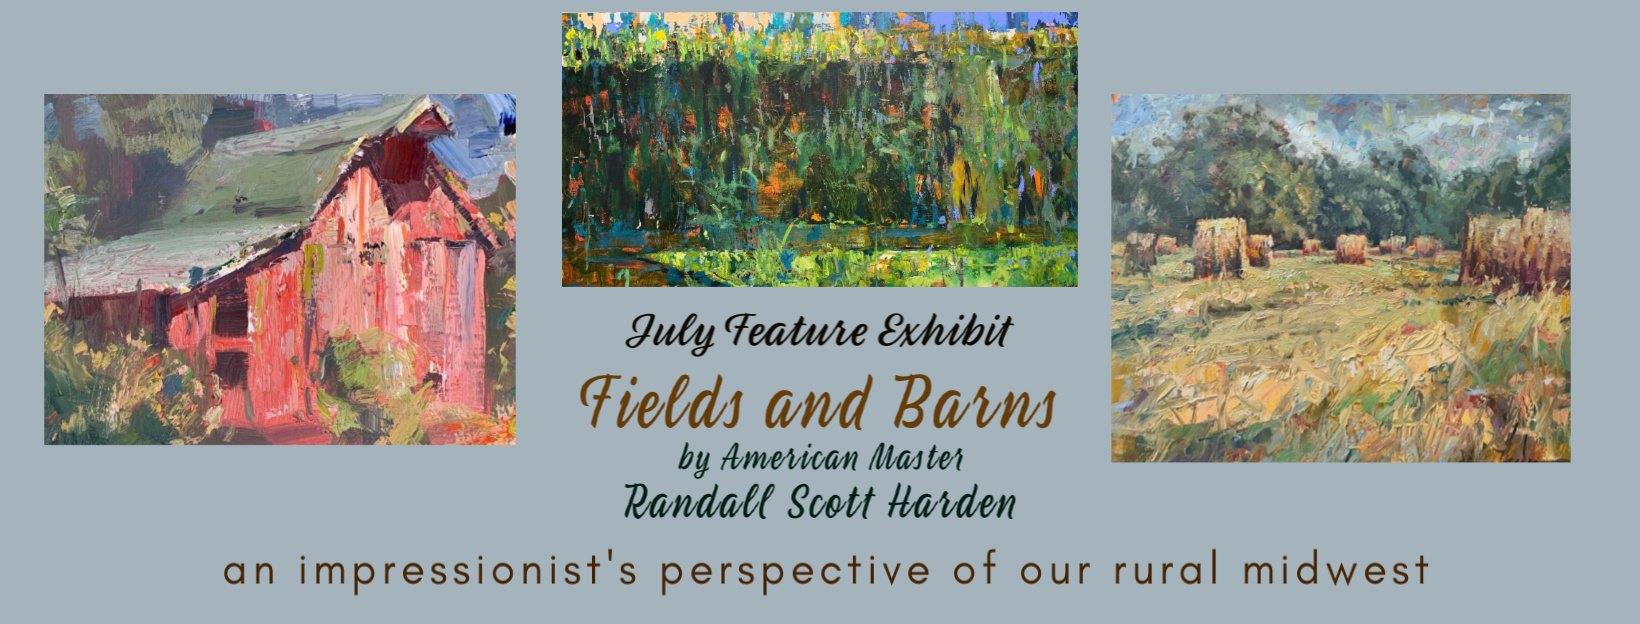 Randall's exhibit.jpg